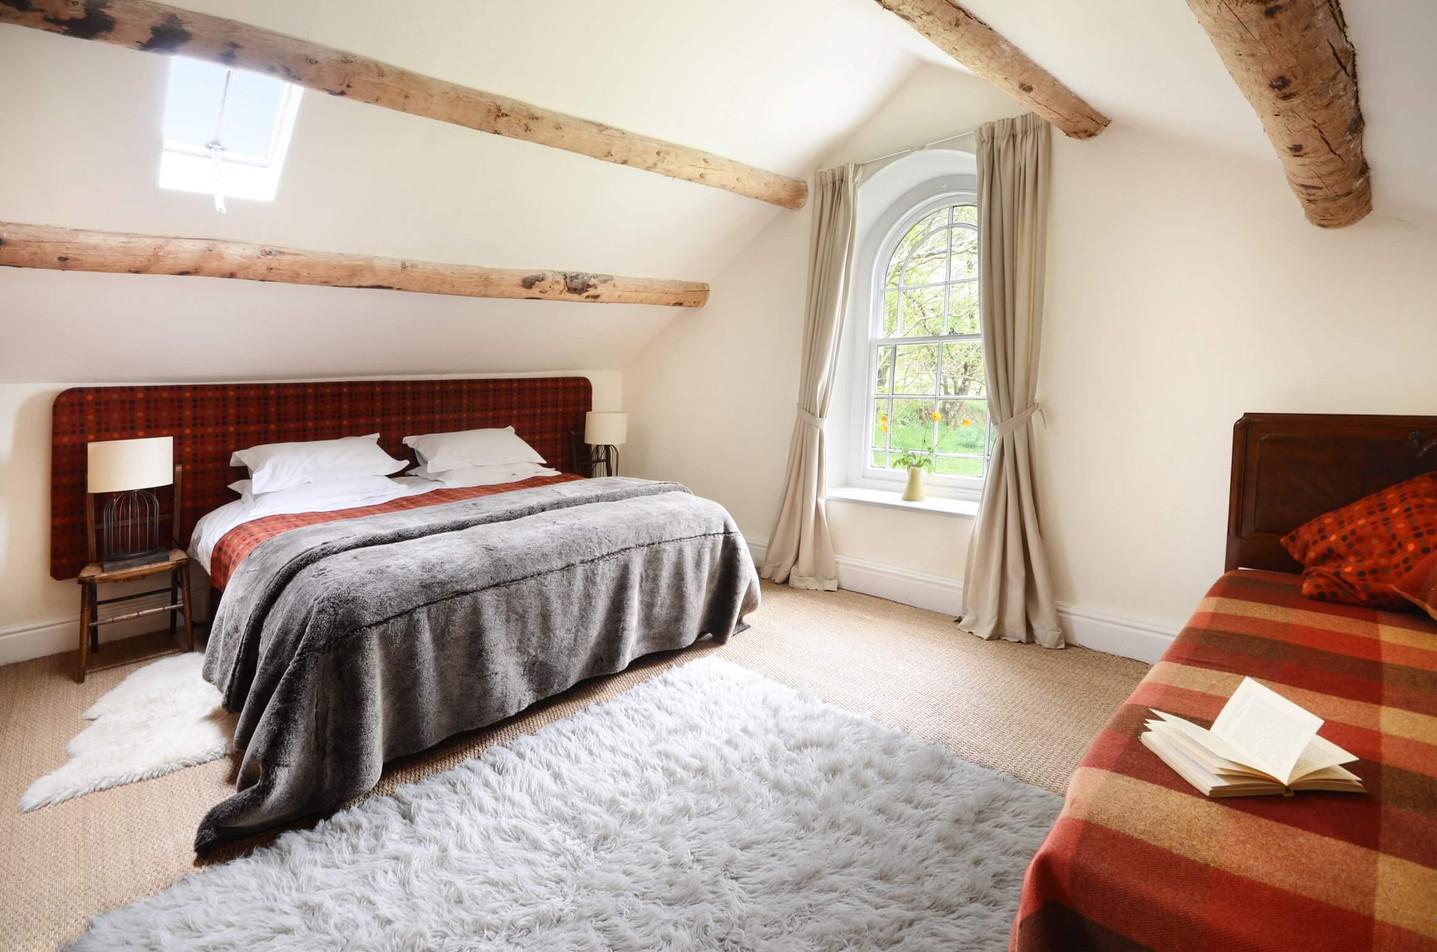 Mountain_Cottage_Bedroom_1_2.jpg